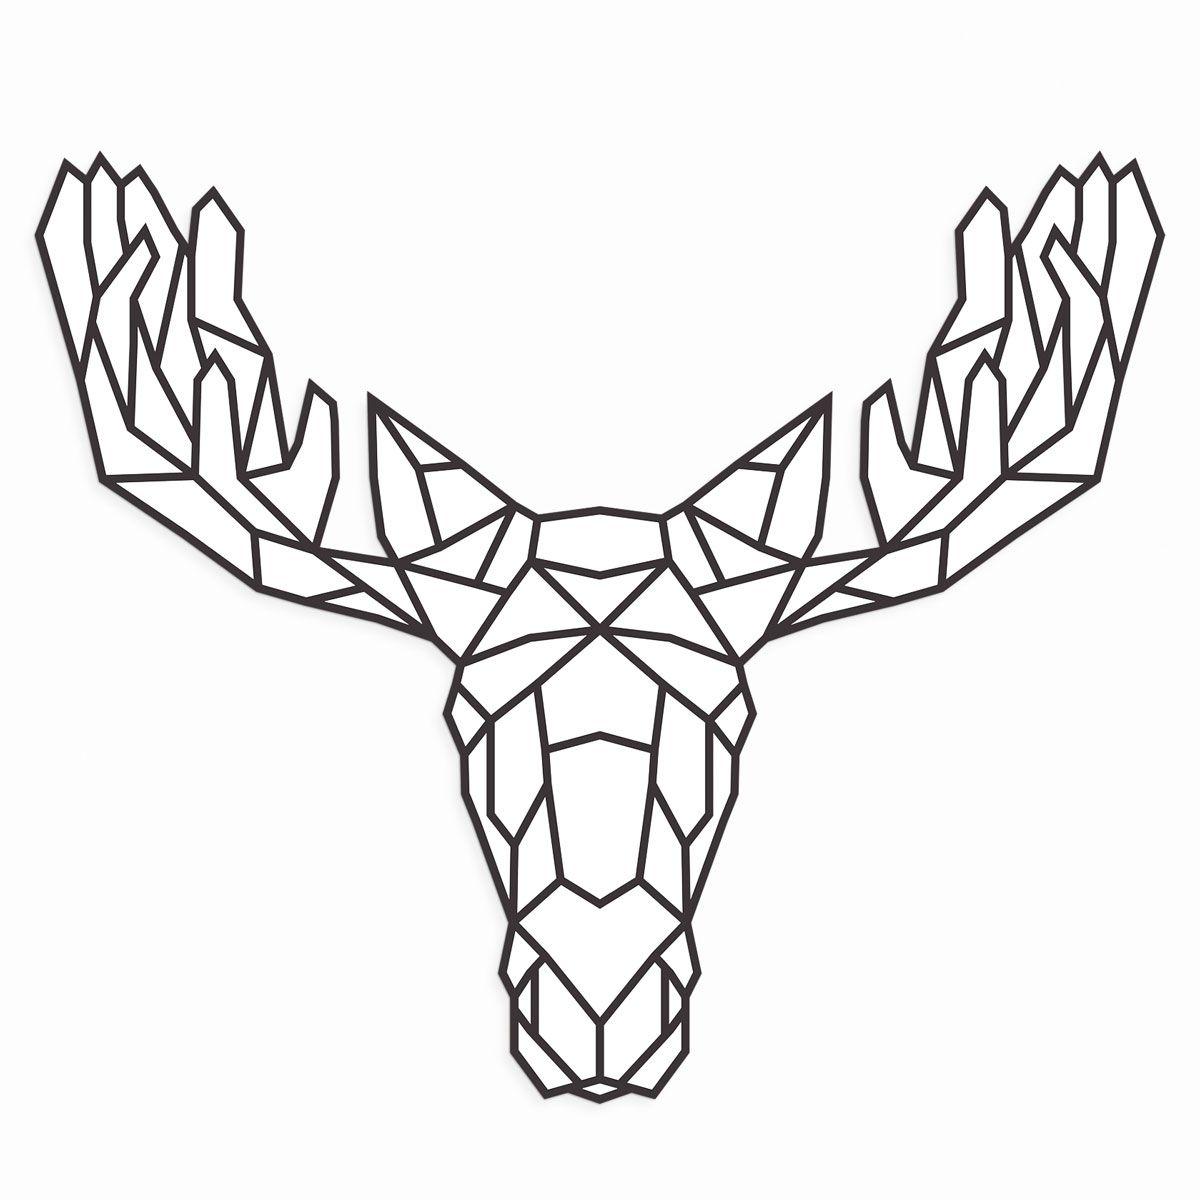 Pin By Smm On Geometric Animal Image Moose Tattoo Geometric Animal Tattoo Geometric